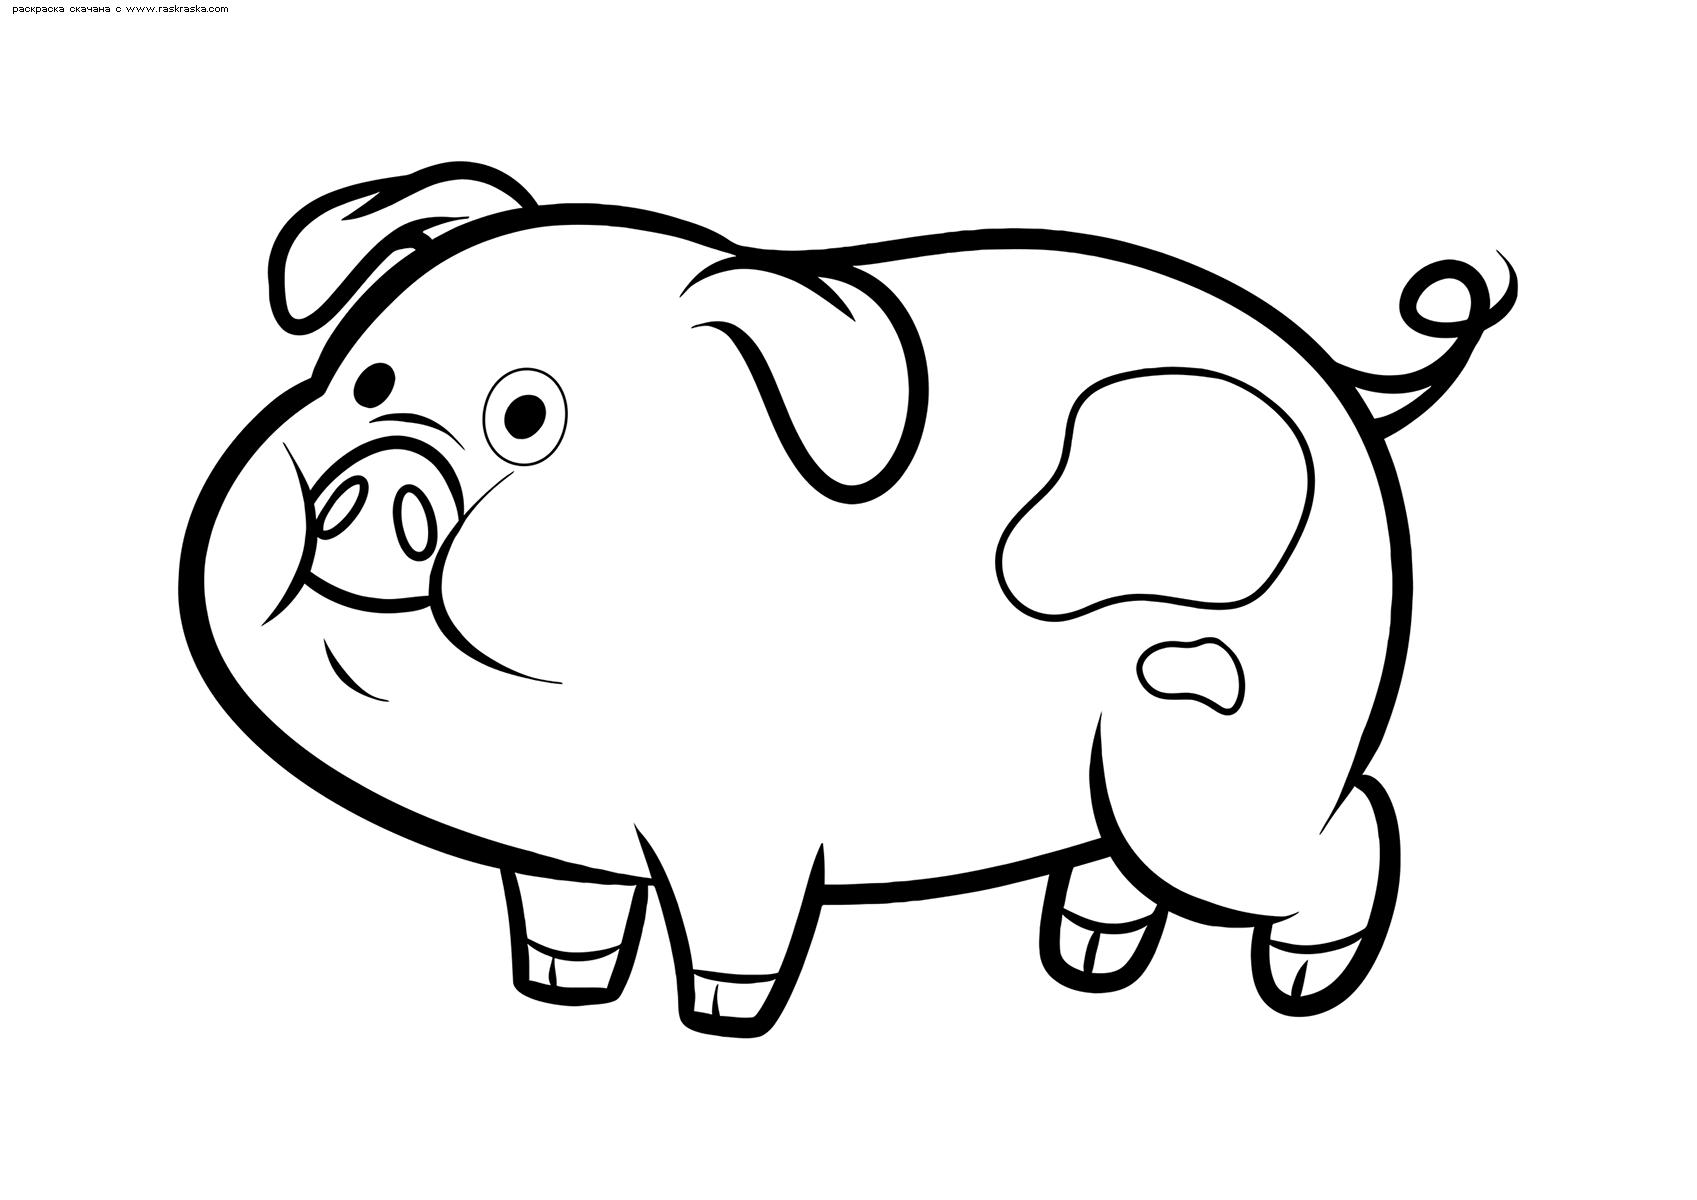 Раскраска Свинка Пухля. Раскраска Свинка из Гравити Фолз